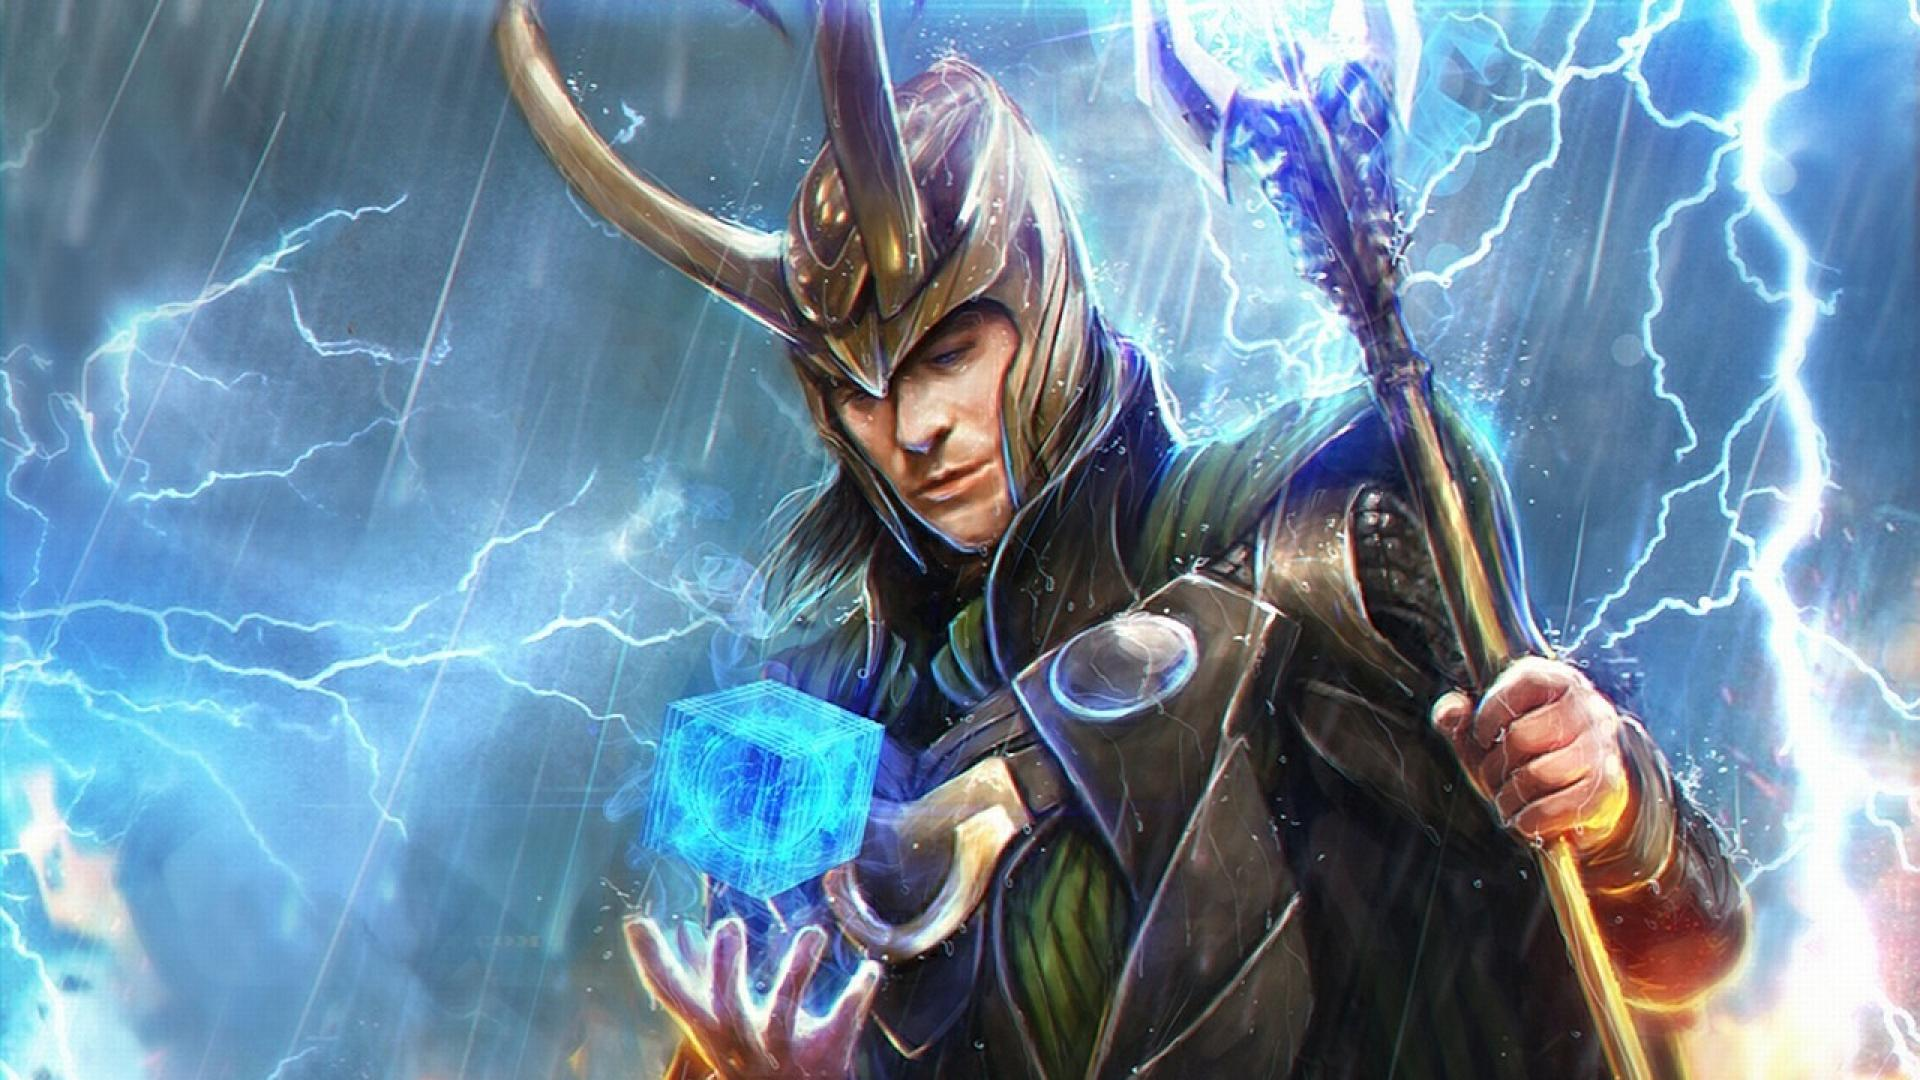 Loki Wallpaper Download 40 Loki Wallp...